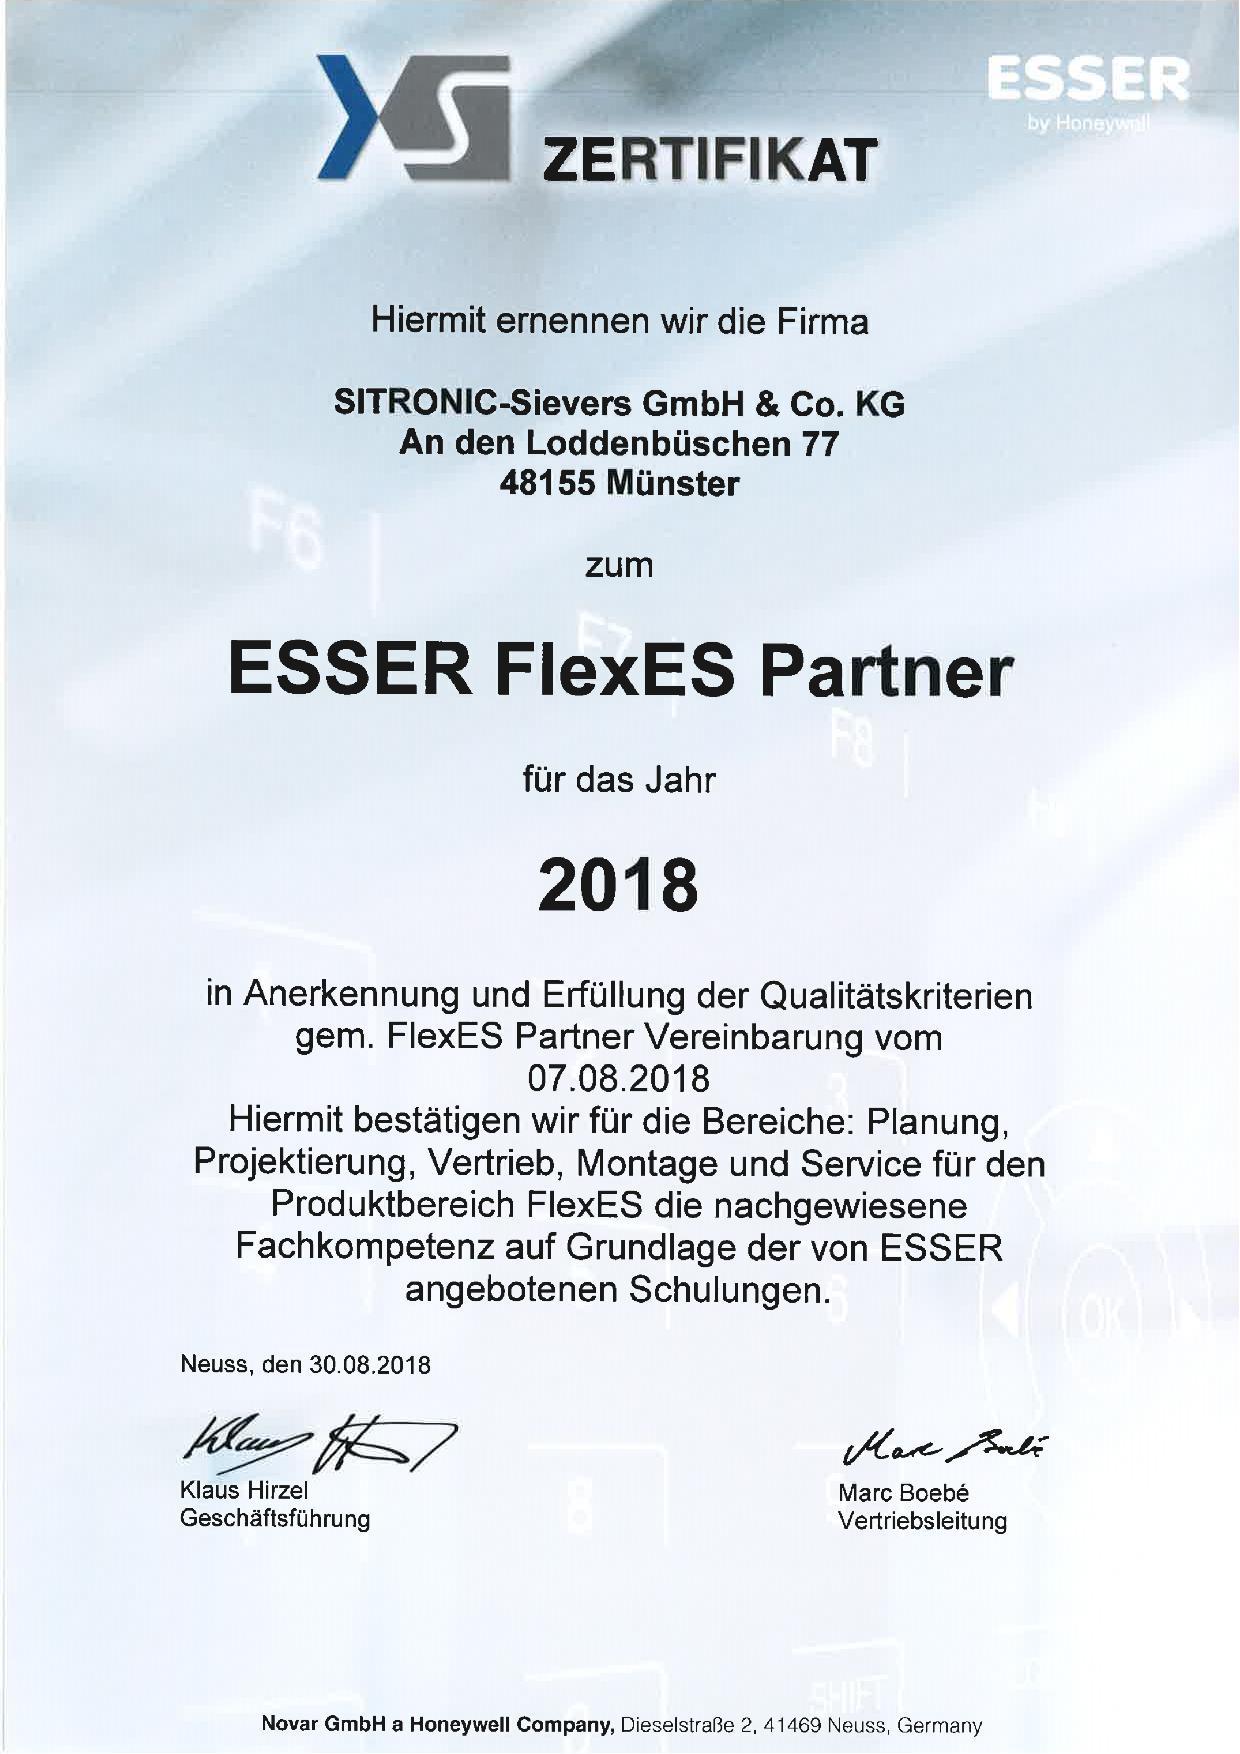 Esser FlexES (SITRONIC Münster)